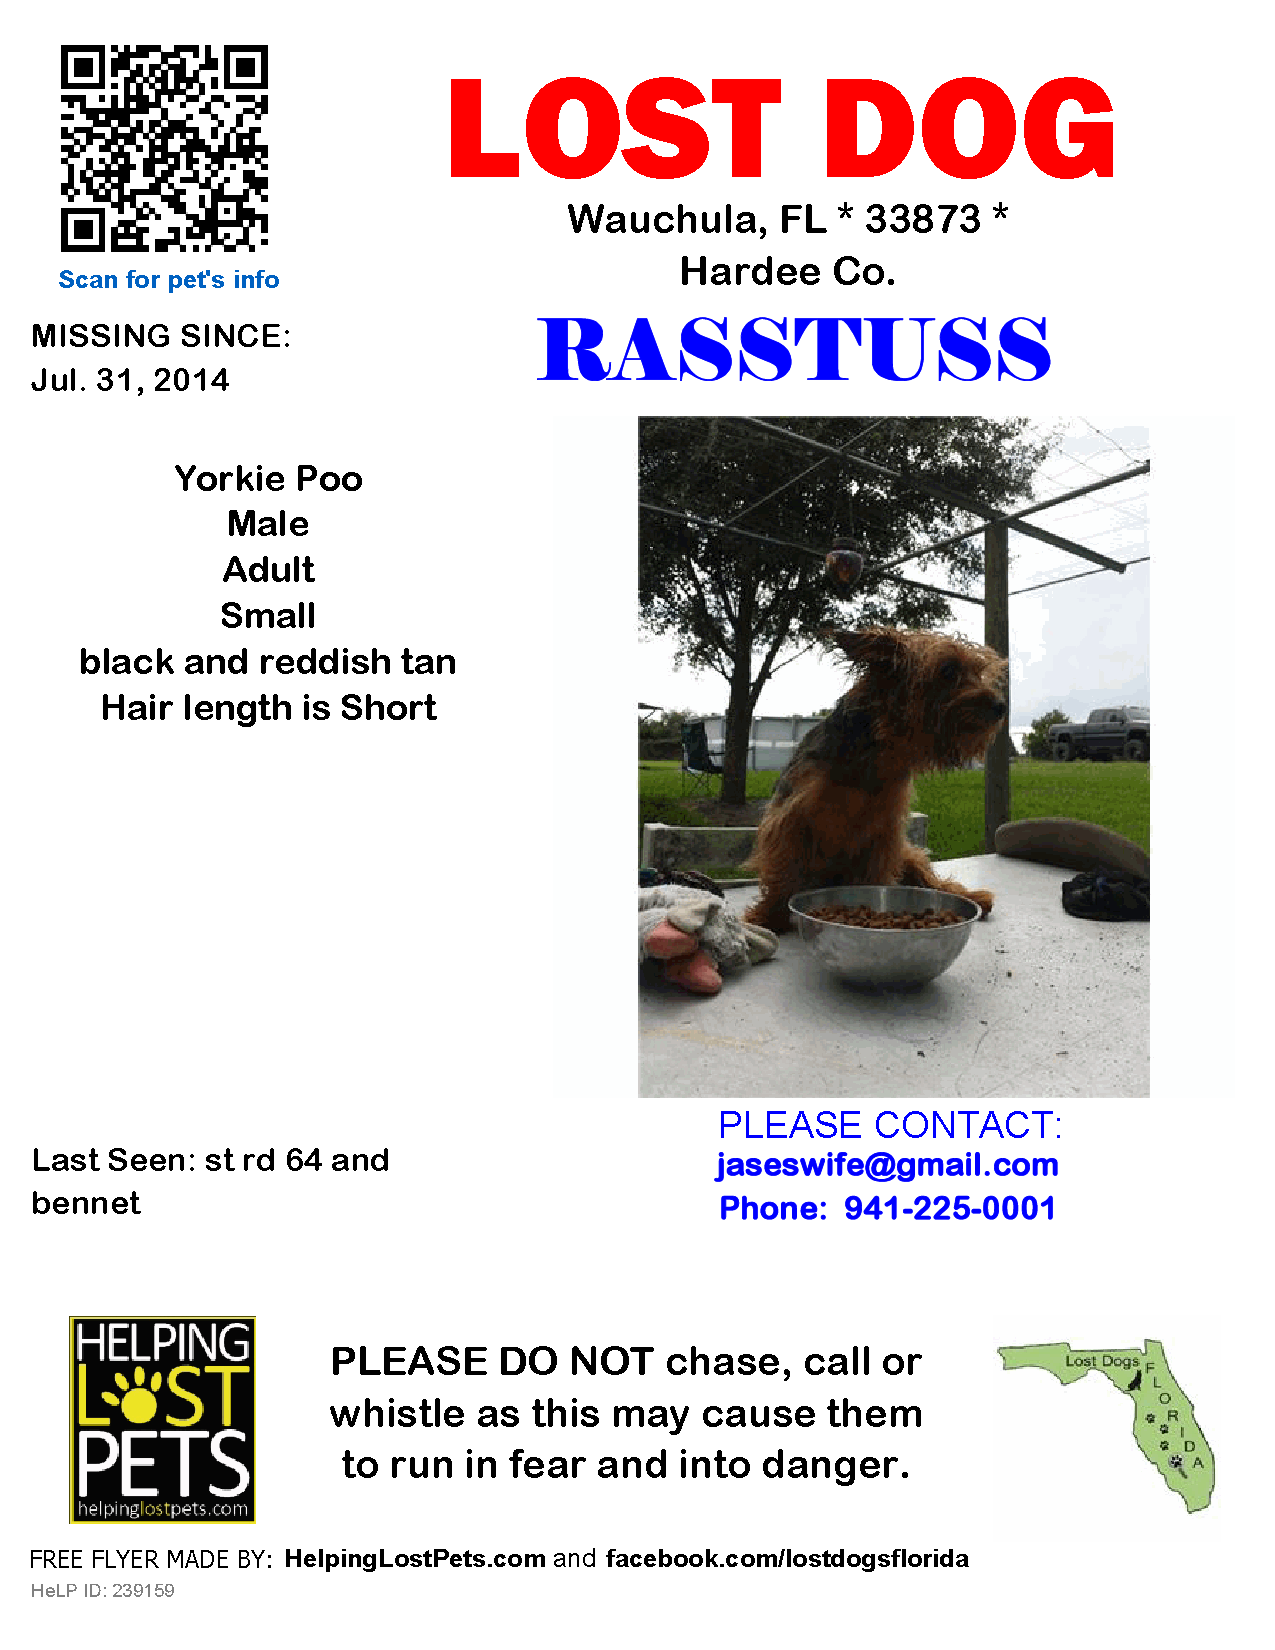 Wauchula St Rd 64 Bennet Fl 33873 Hardee Co Lost Dog 07 31 2014 Yorkie Poo Black Reddish Tan Note From Famil Losing A Dog Yorkie Yorkie Poo